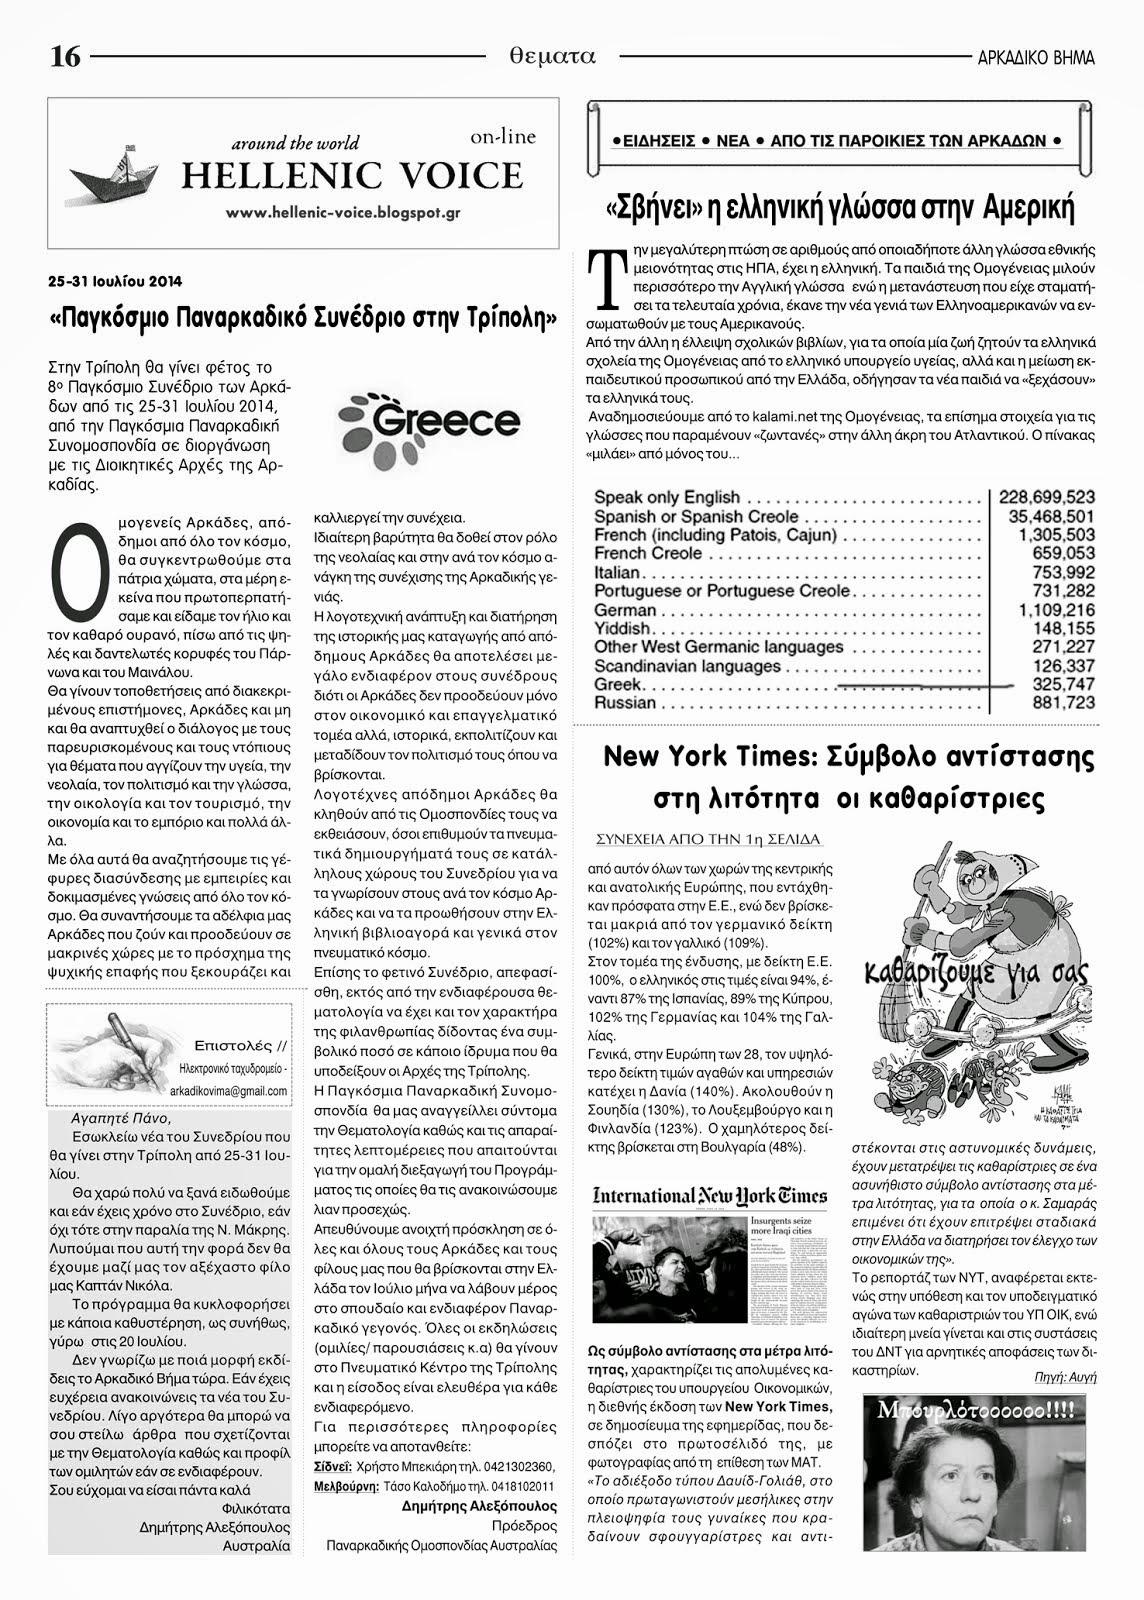 Hellenic Voice κάθε μήνα με ειδήσεις από τον Απόδημο Ελληνισμό